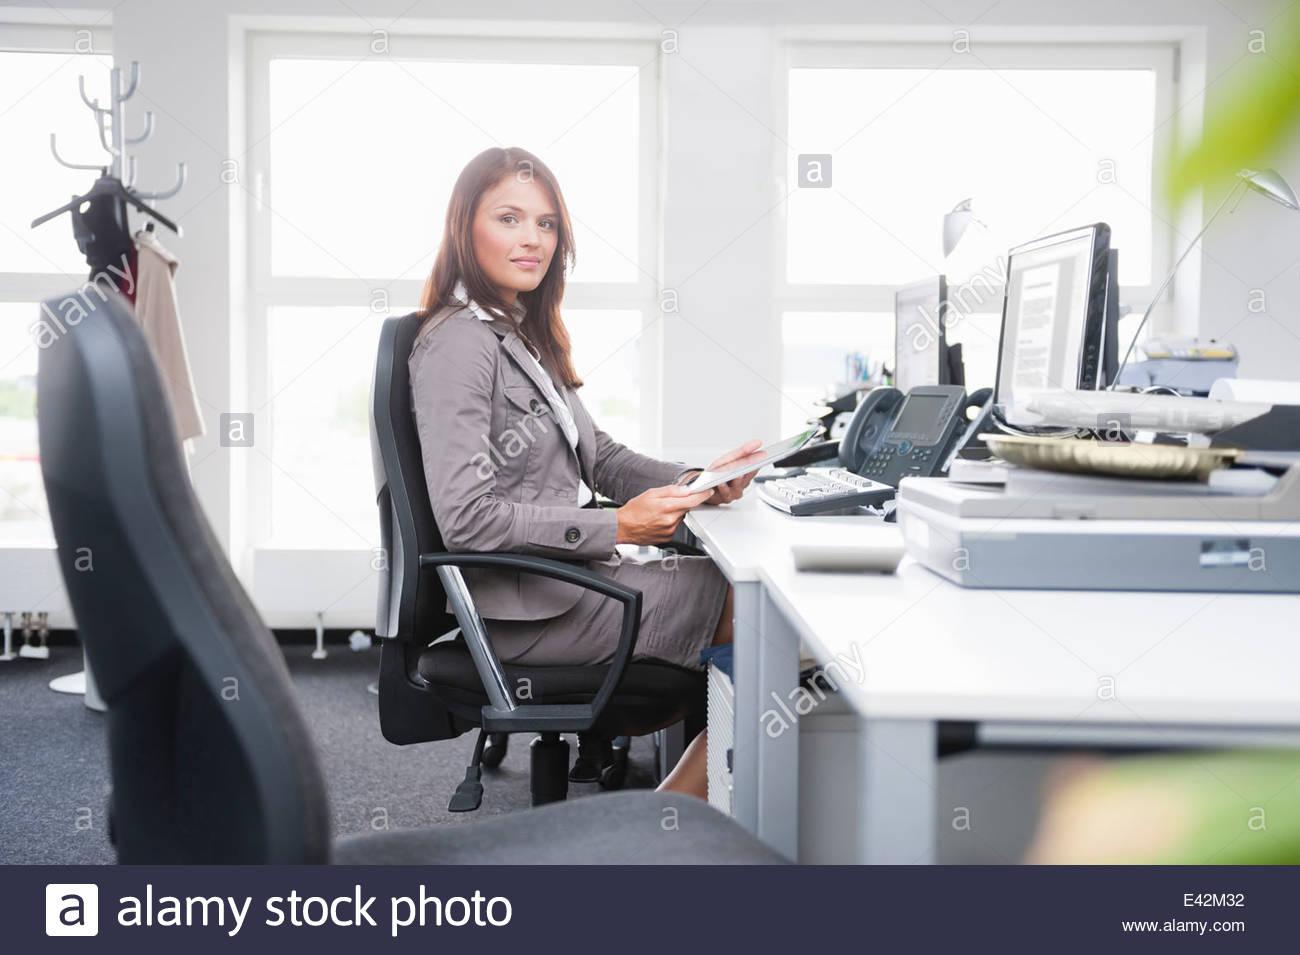 mid-adult-woman-sitting-at-desk-E42M32.j